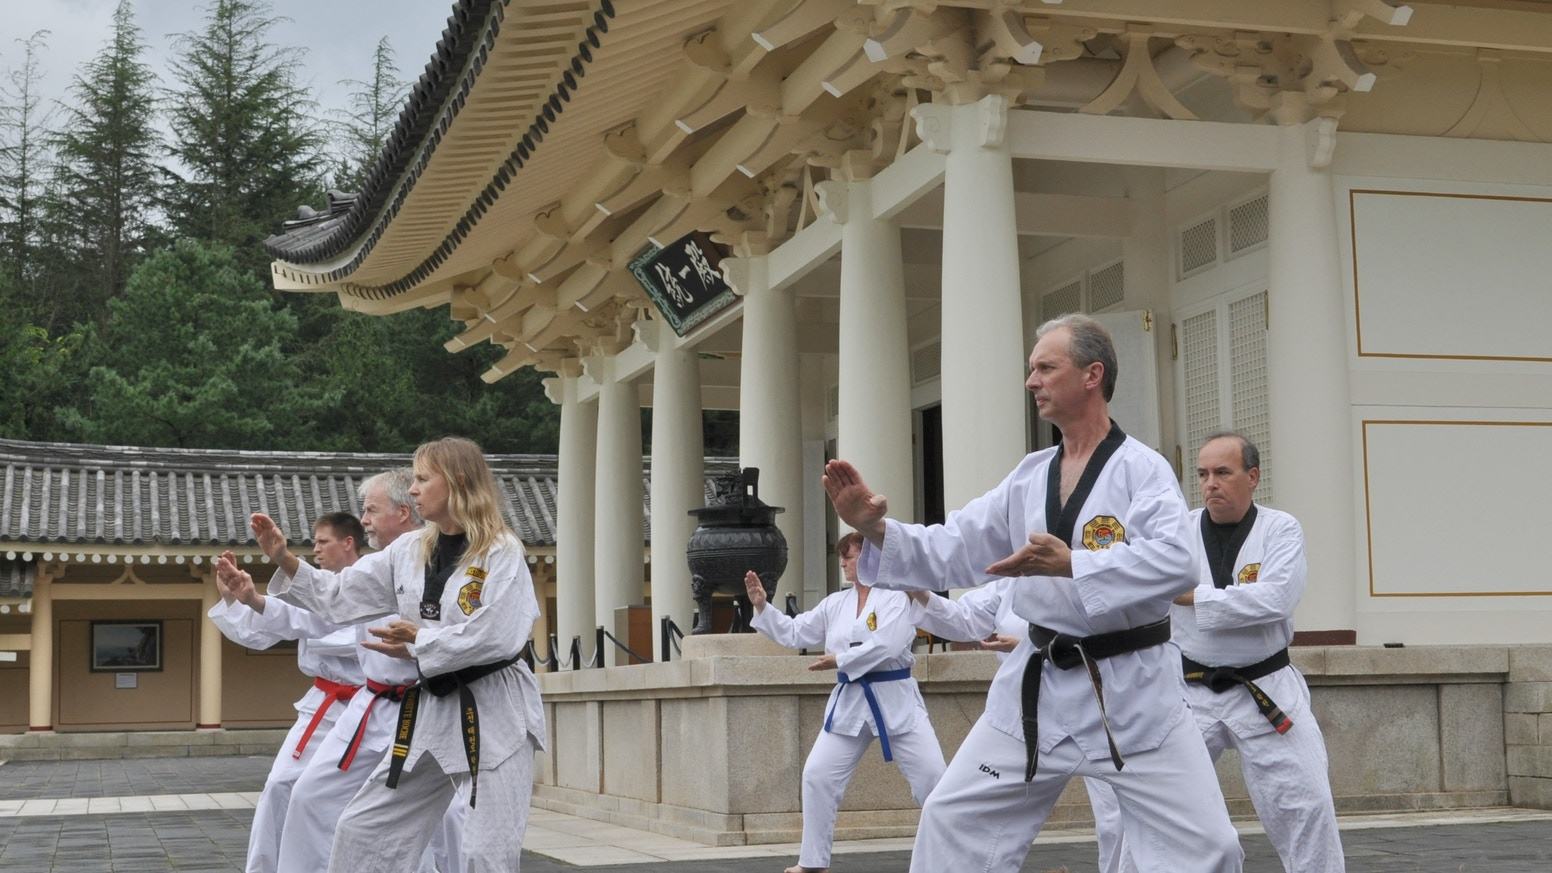 545763e8ae2c3 TAEKWONDO TRAINING IN KOREA - A DOCUMENTARY by Master Doug Cook ...